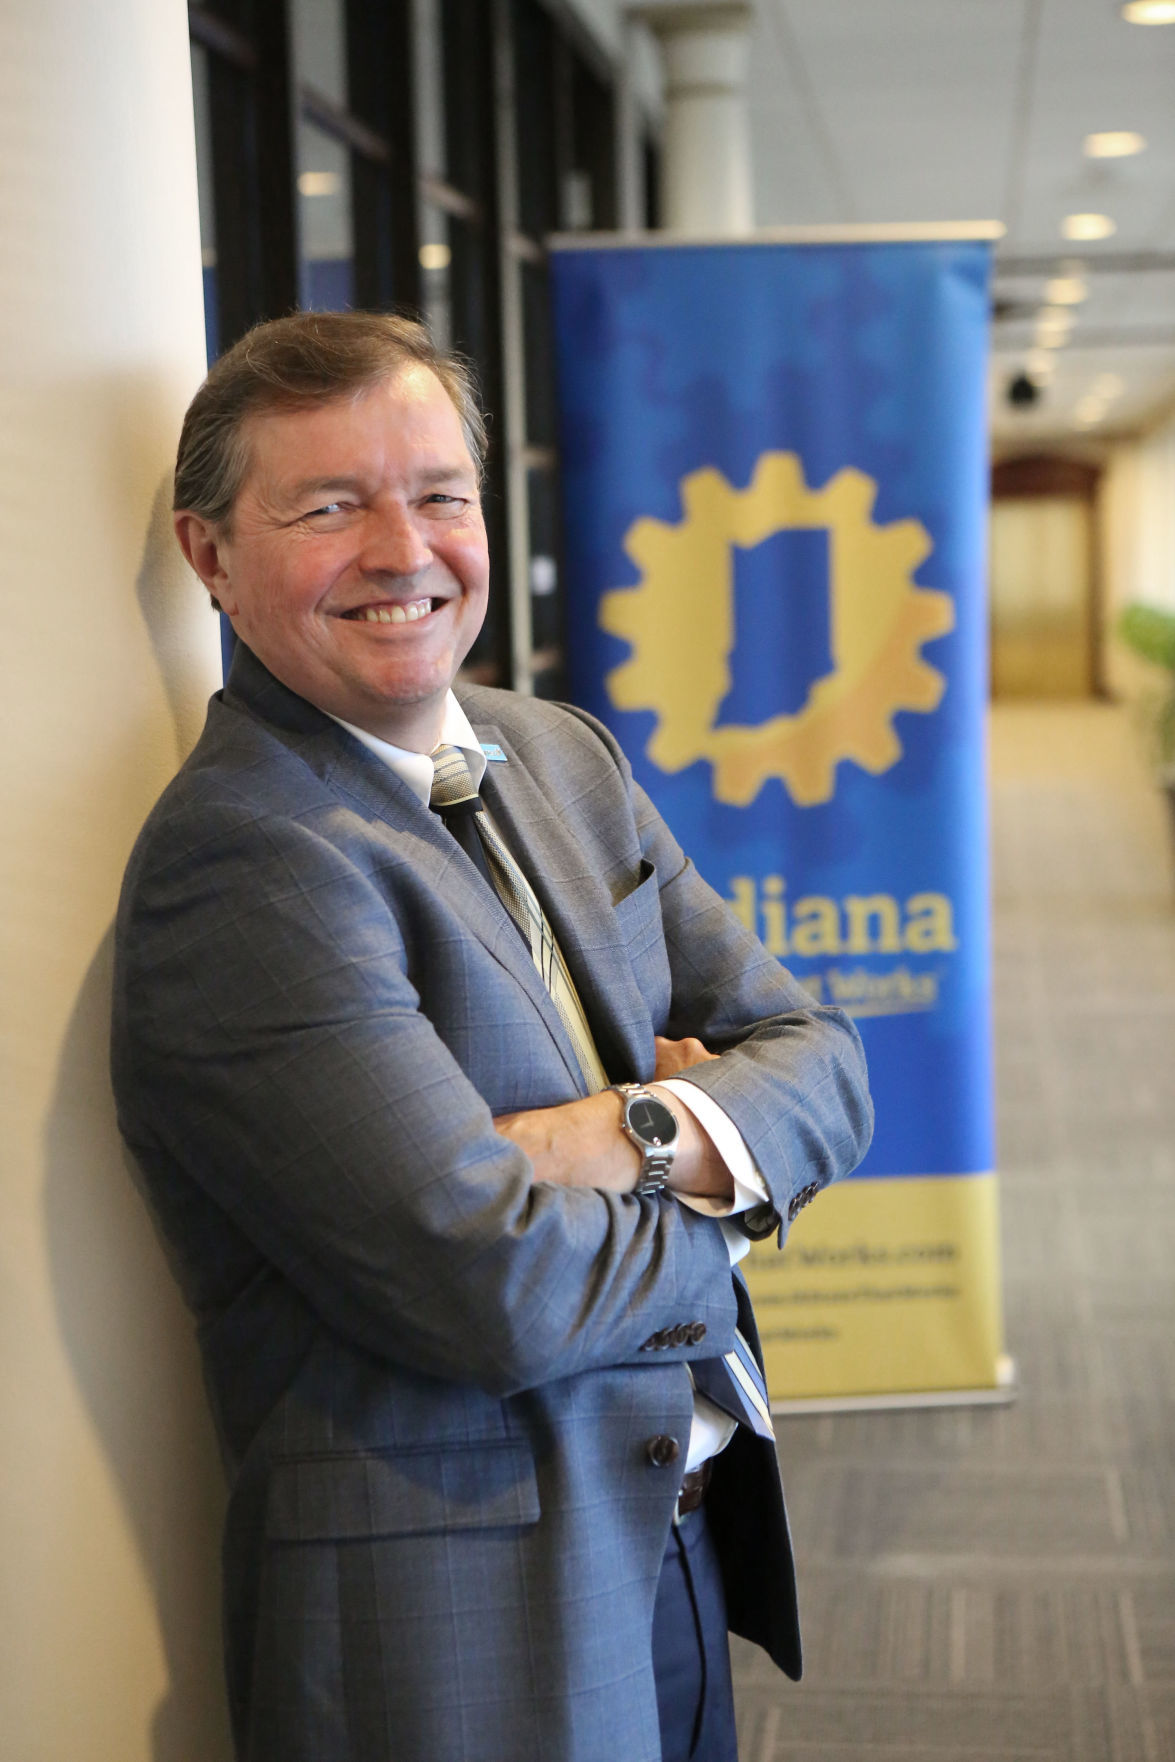 NIPSCO's Dan Babcock to be honored at The 2018 Rail Supply Chain Summit